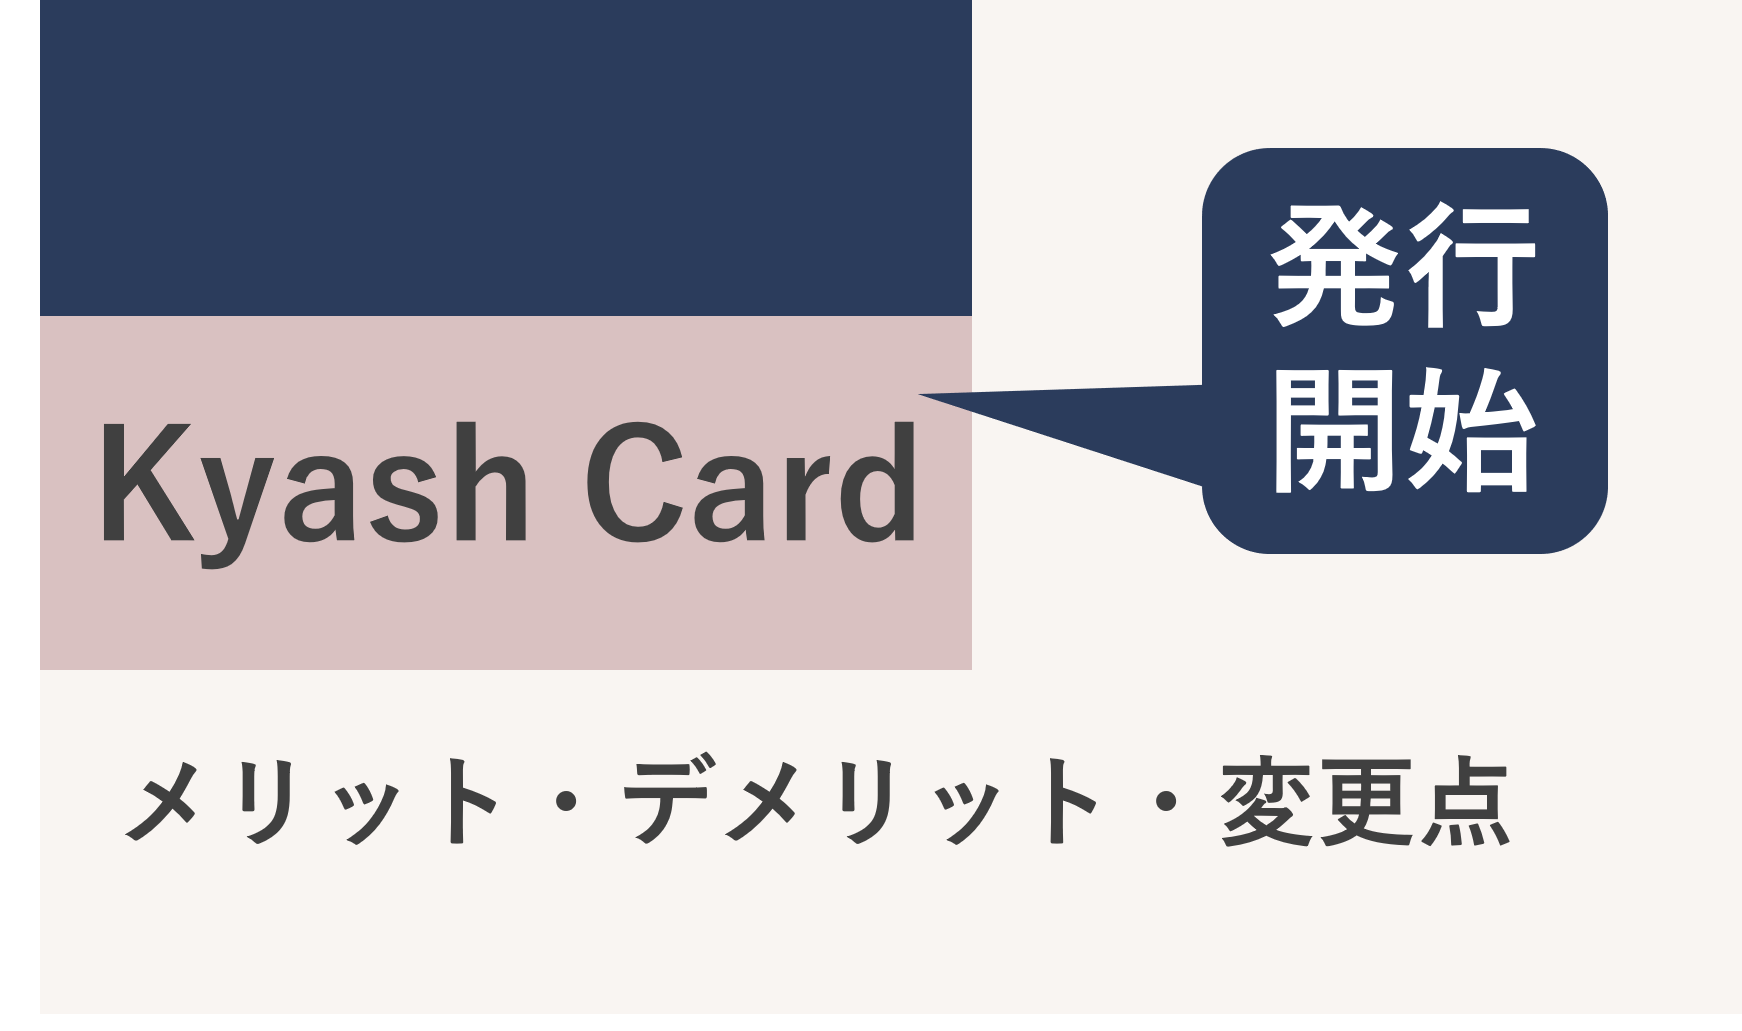 Kyash Card 発行開始 デメリット